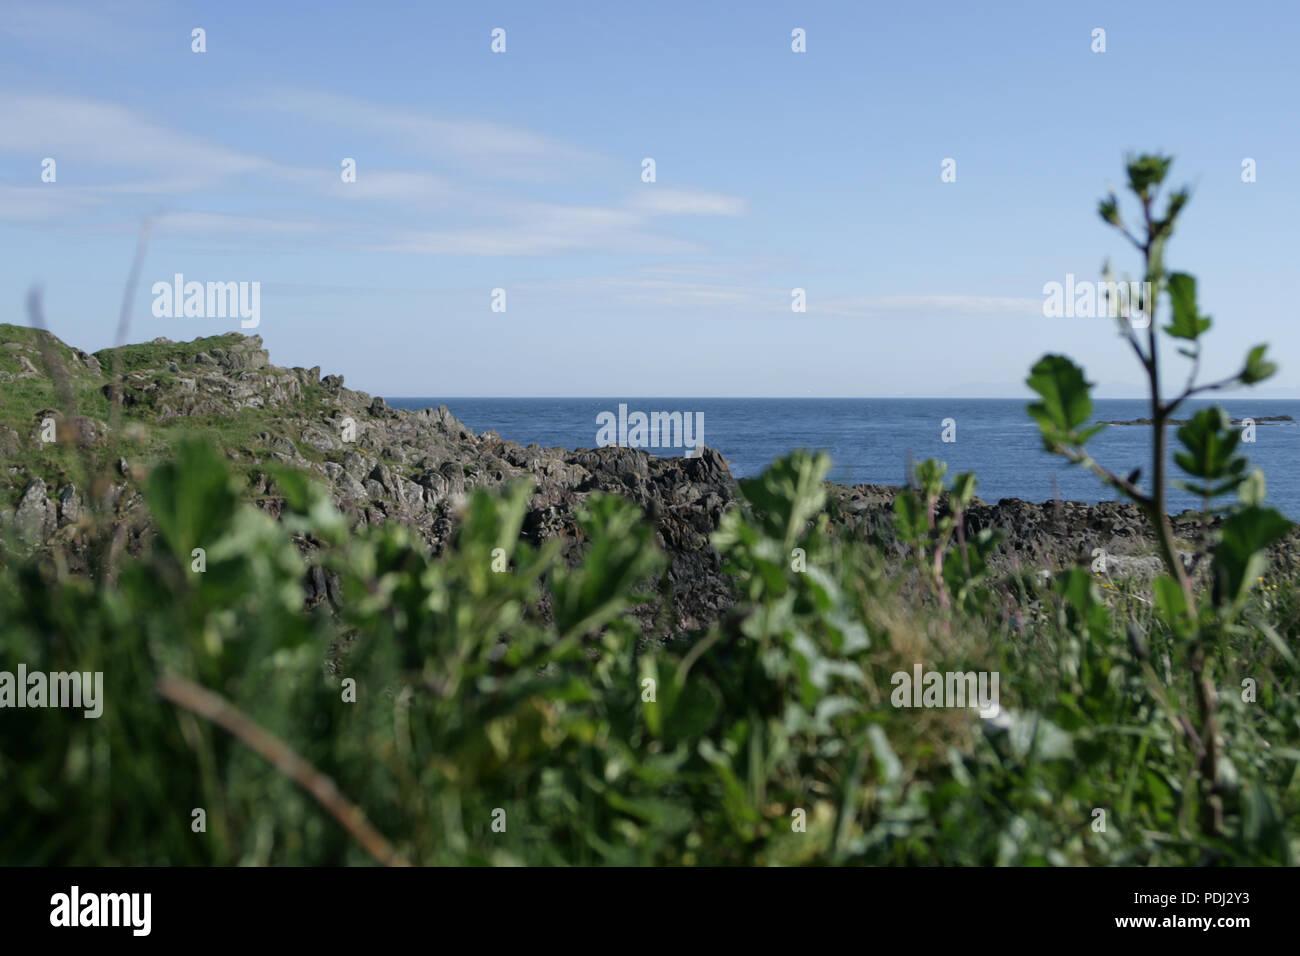 Craggy rocks on the Scottish coastline - Stock Image